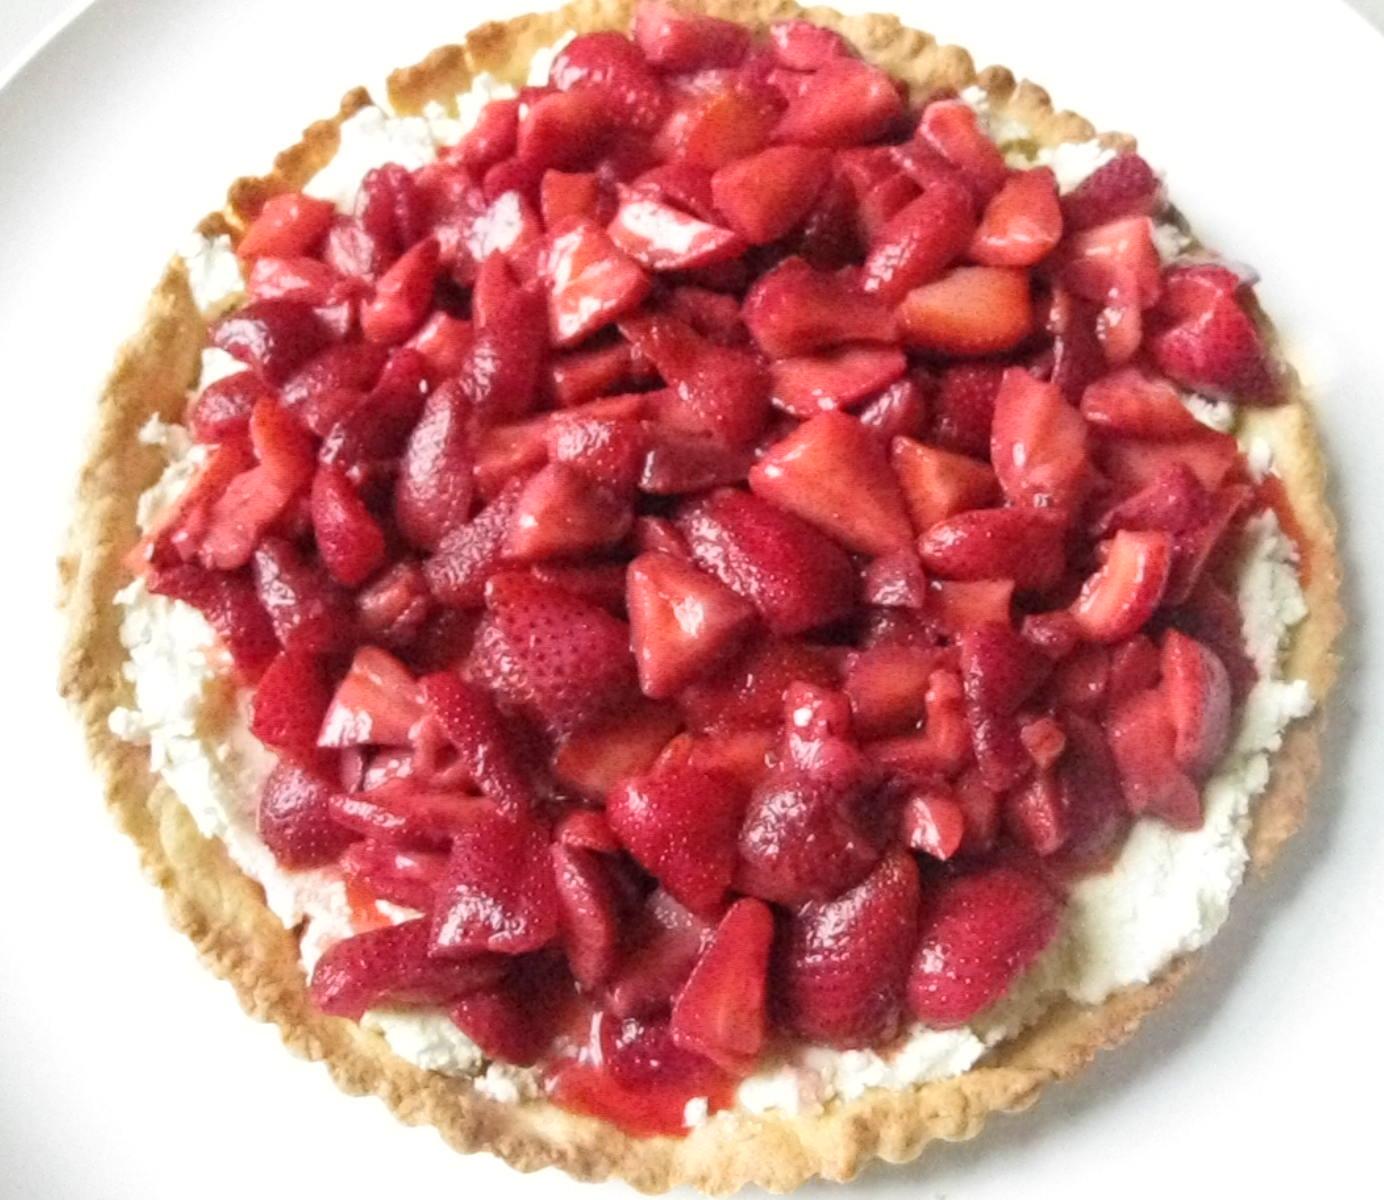 Surprise Mom With Strawberry Mascarpone Tart | POPSUGAR Food